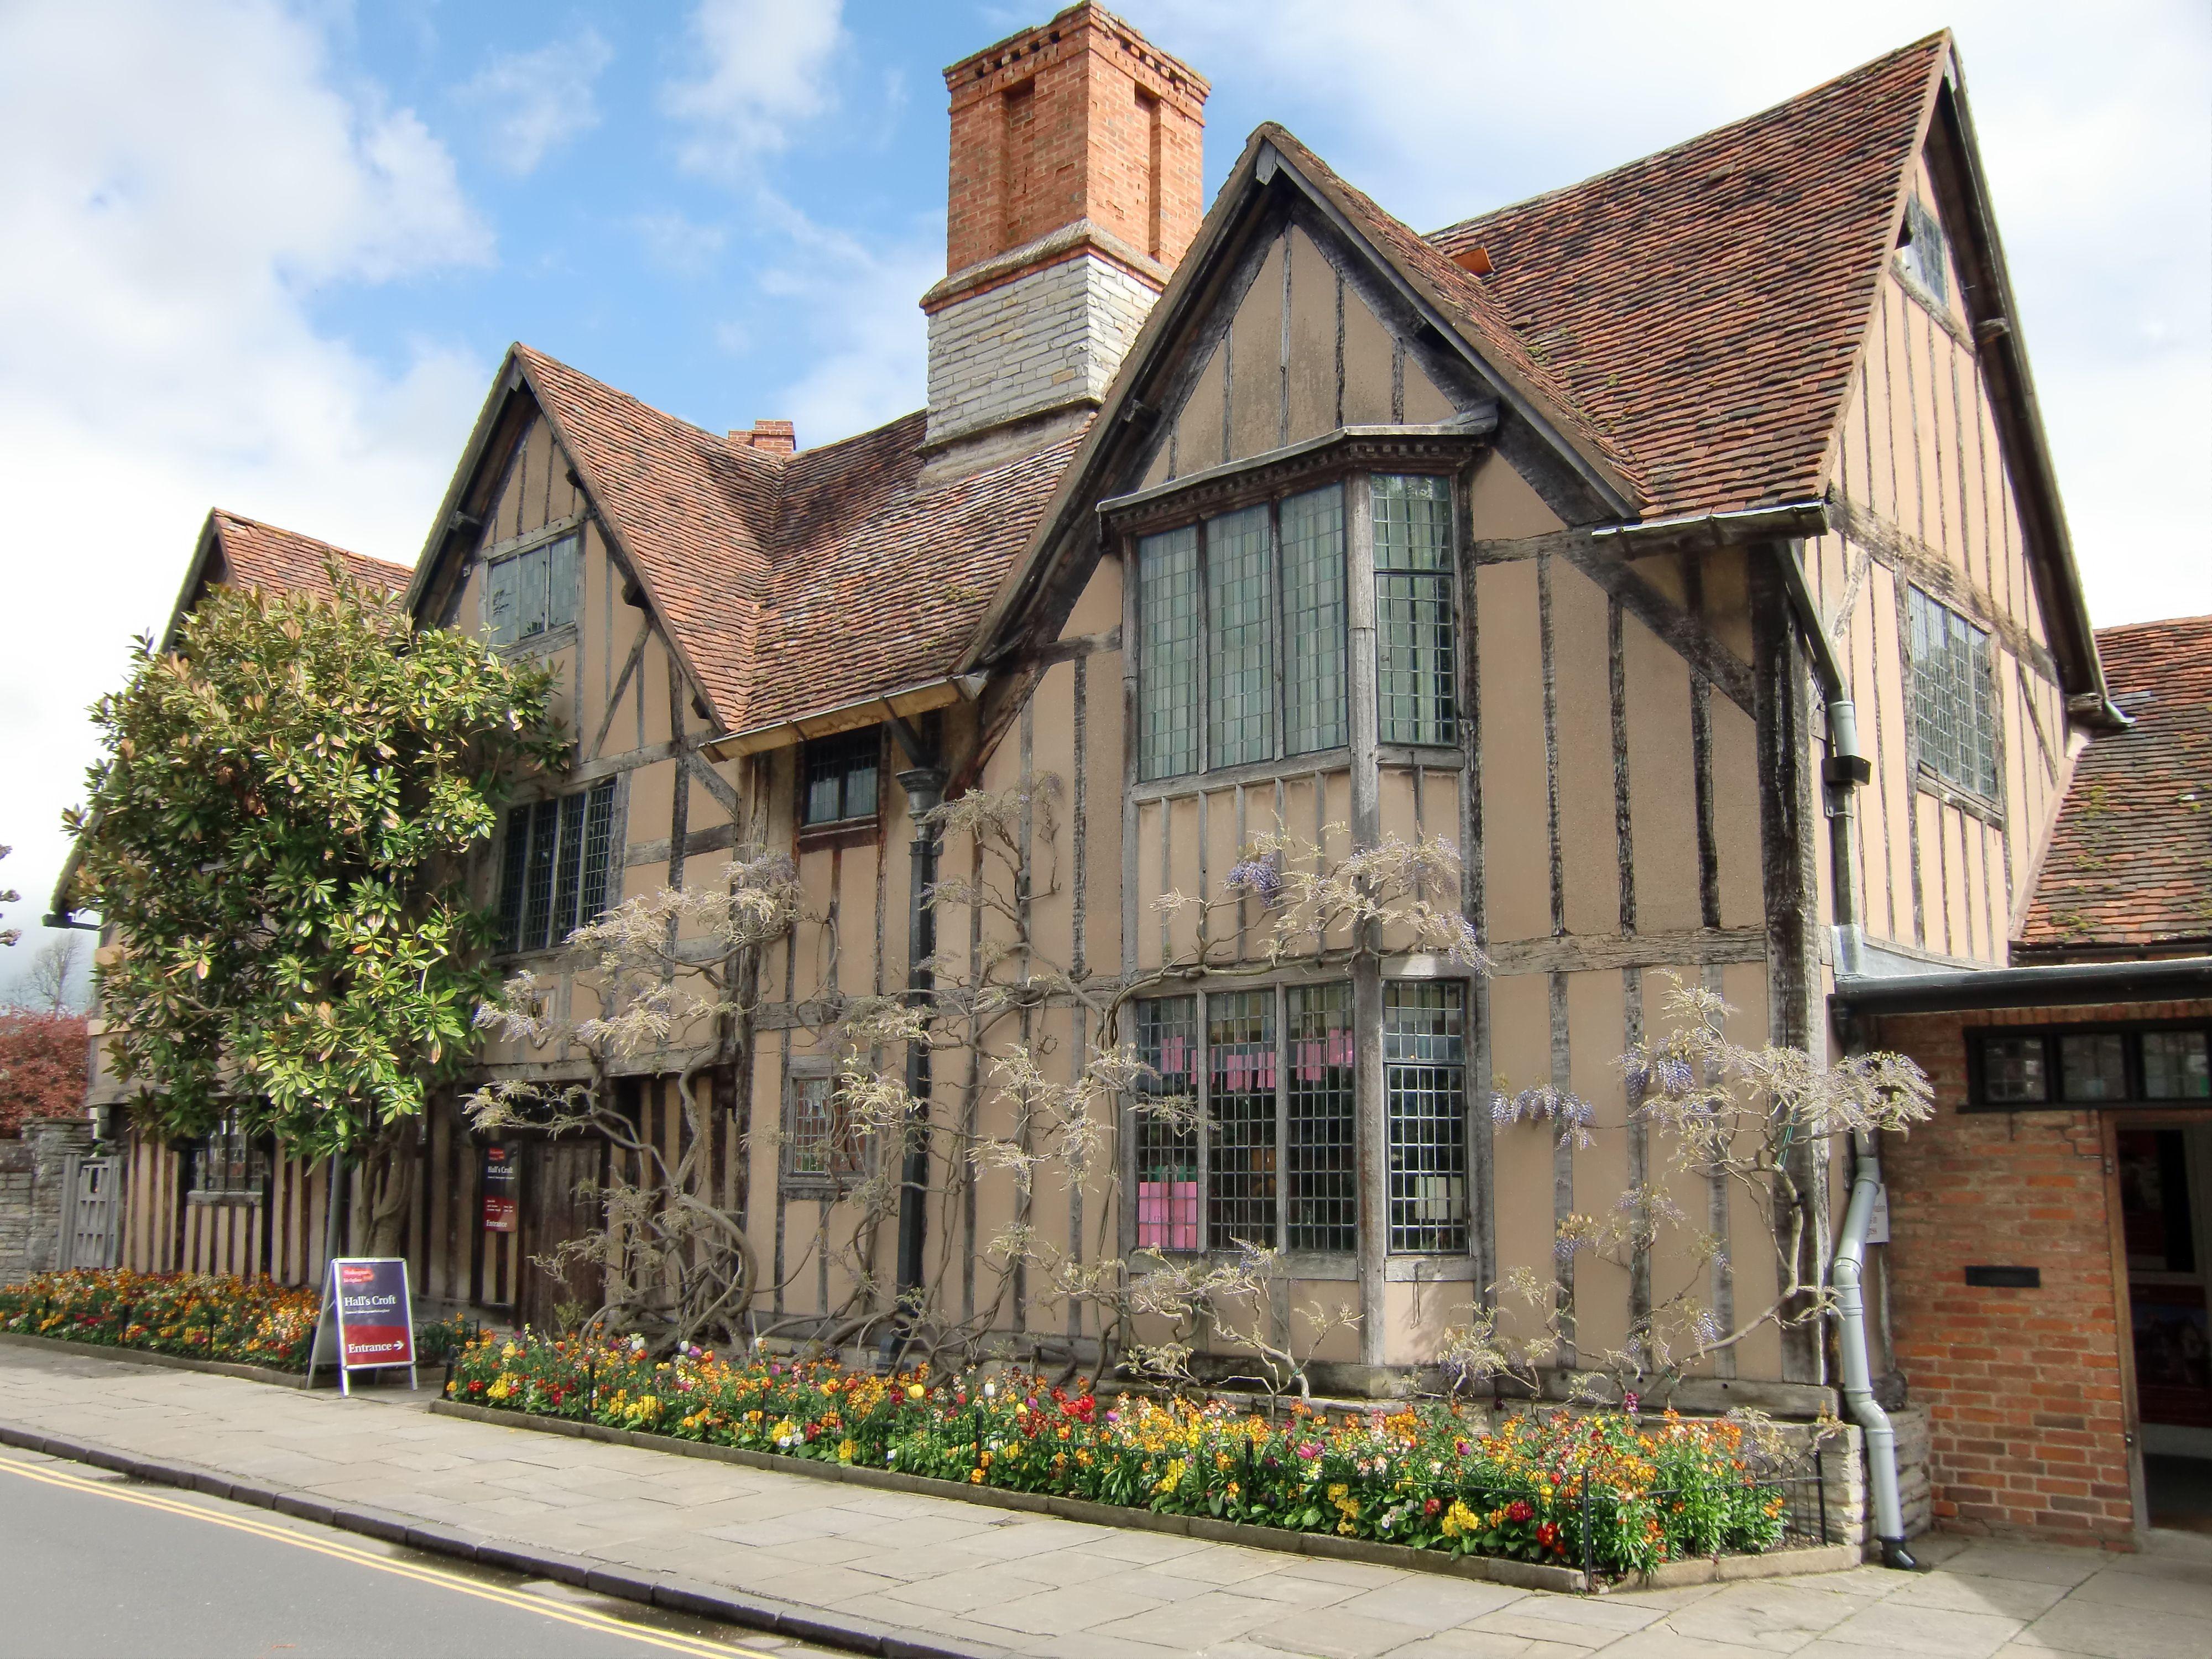 Crofts Hall, Stratford upon Avon